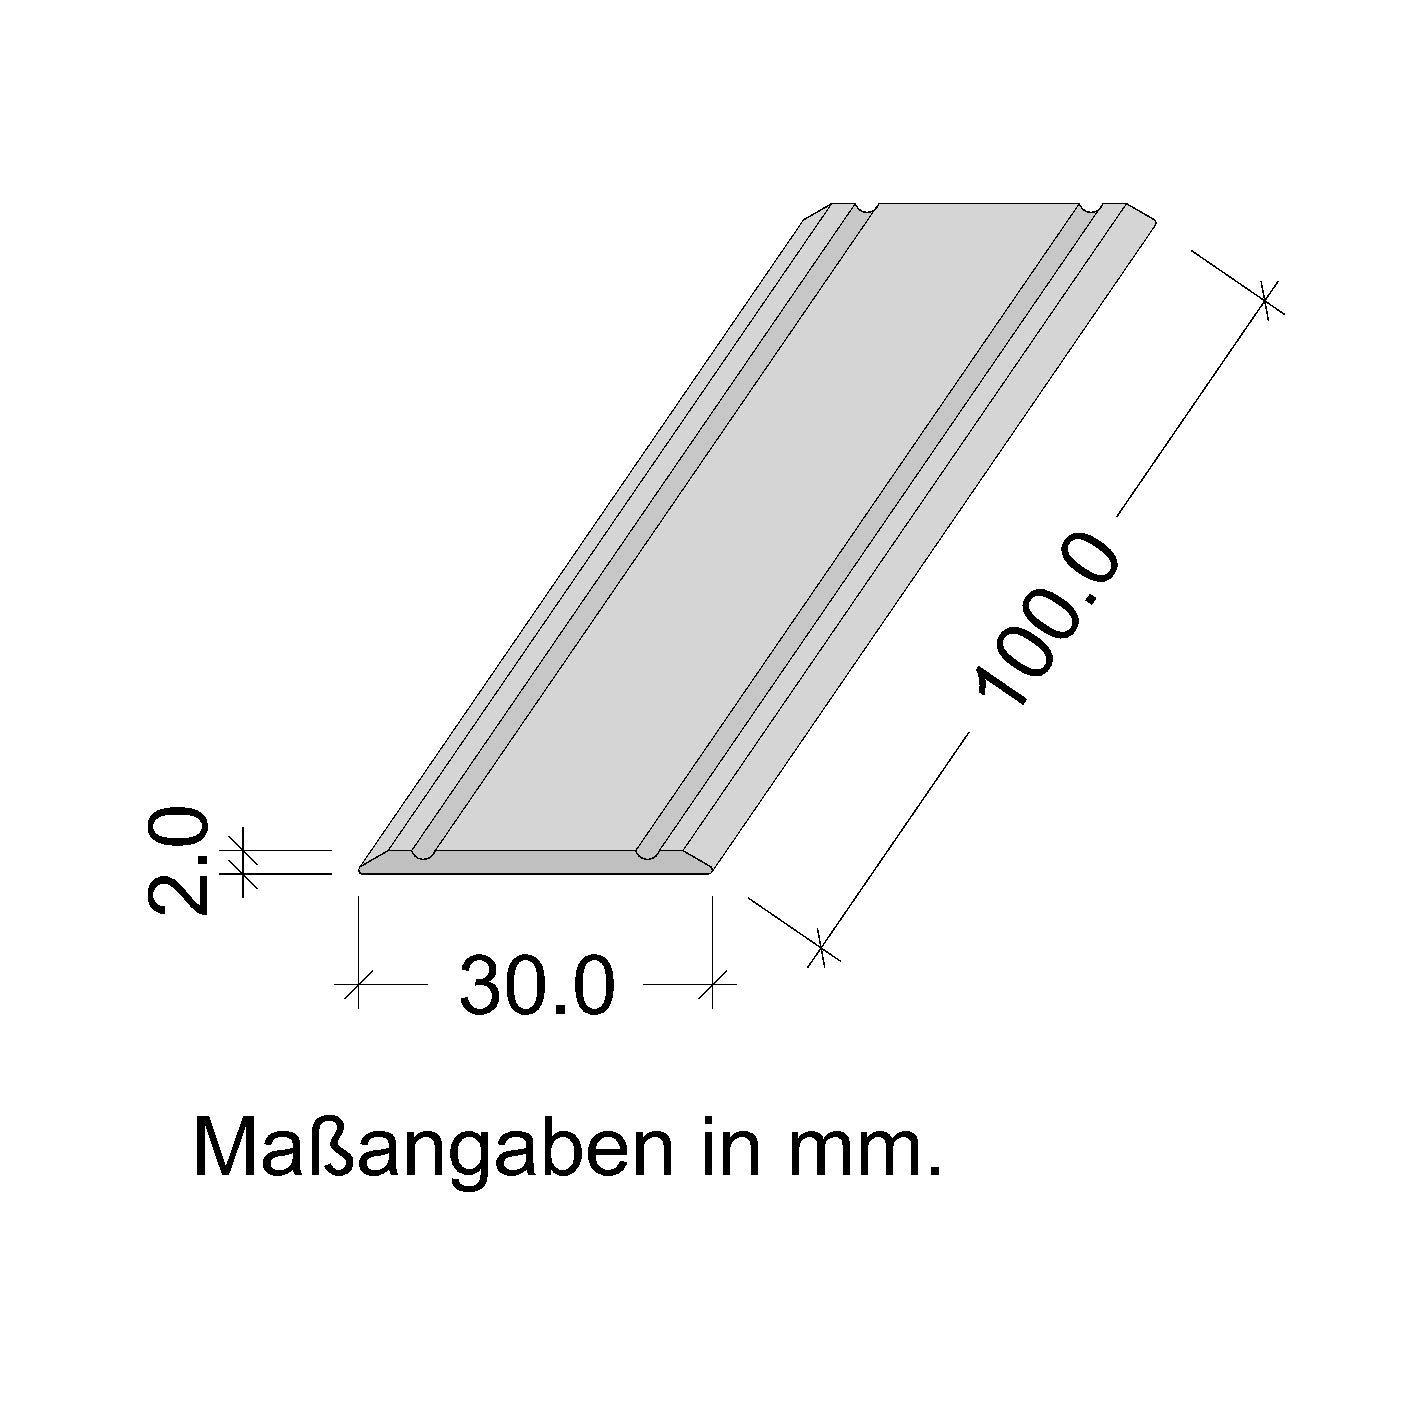 100 cm Aluminium bronze anodised GedoTec Transition profile self adhesive Aluminium SUPER FLAT Transition rail Soil profile Wide 30 mm 3 Colors 100 cm or 200 cm Made in Germany